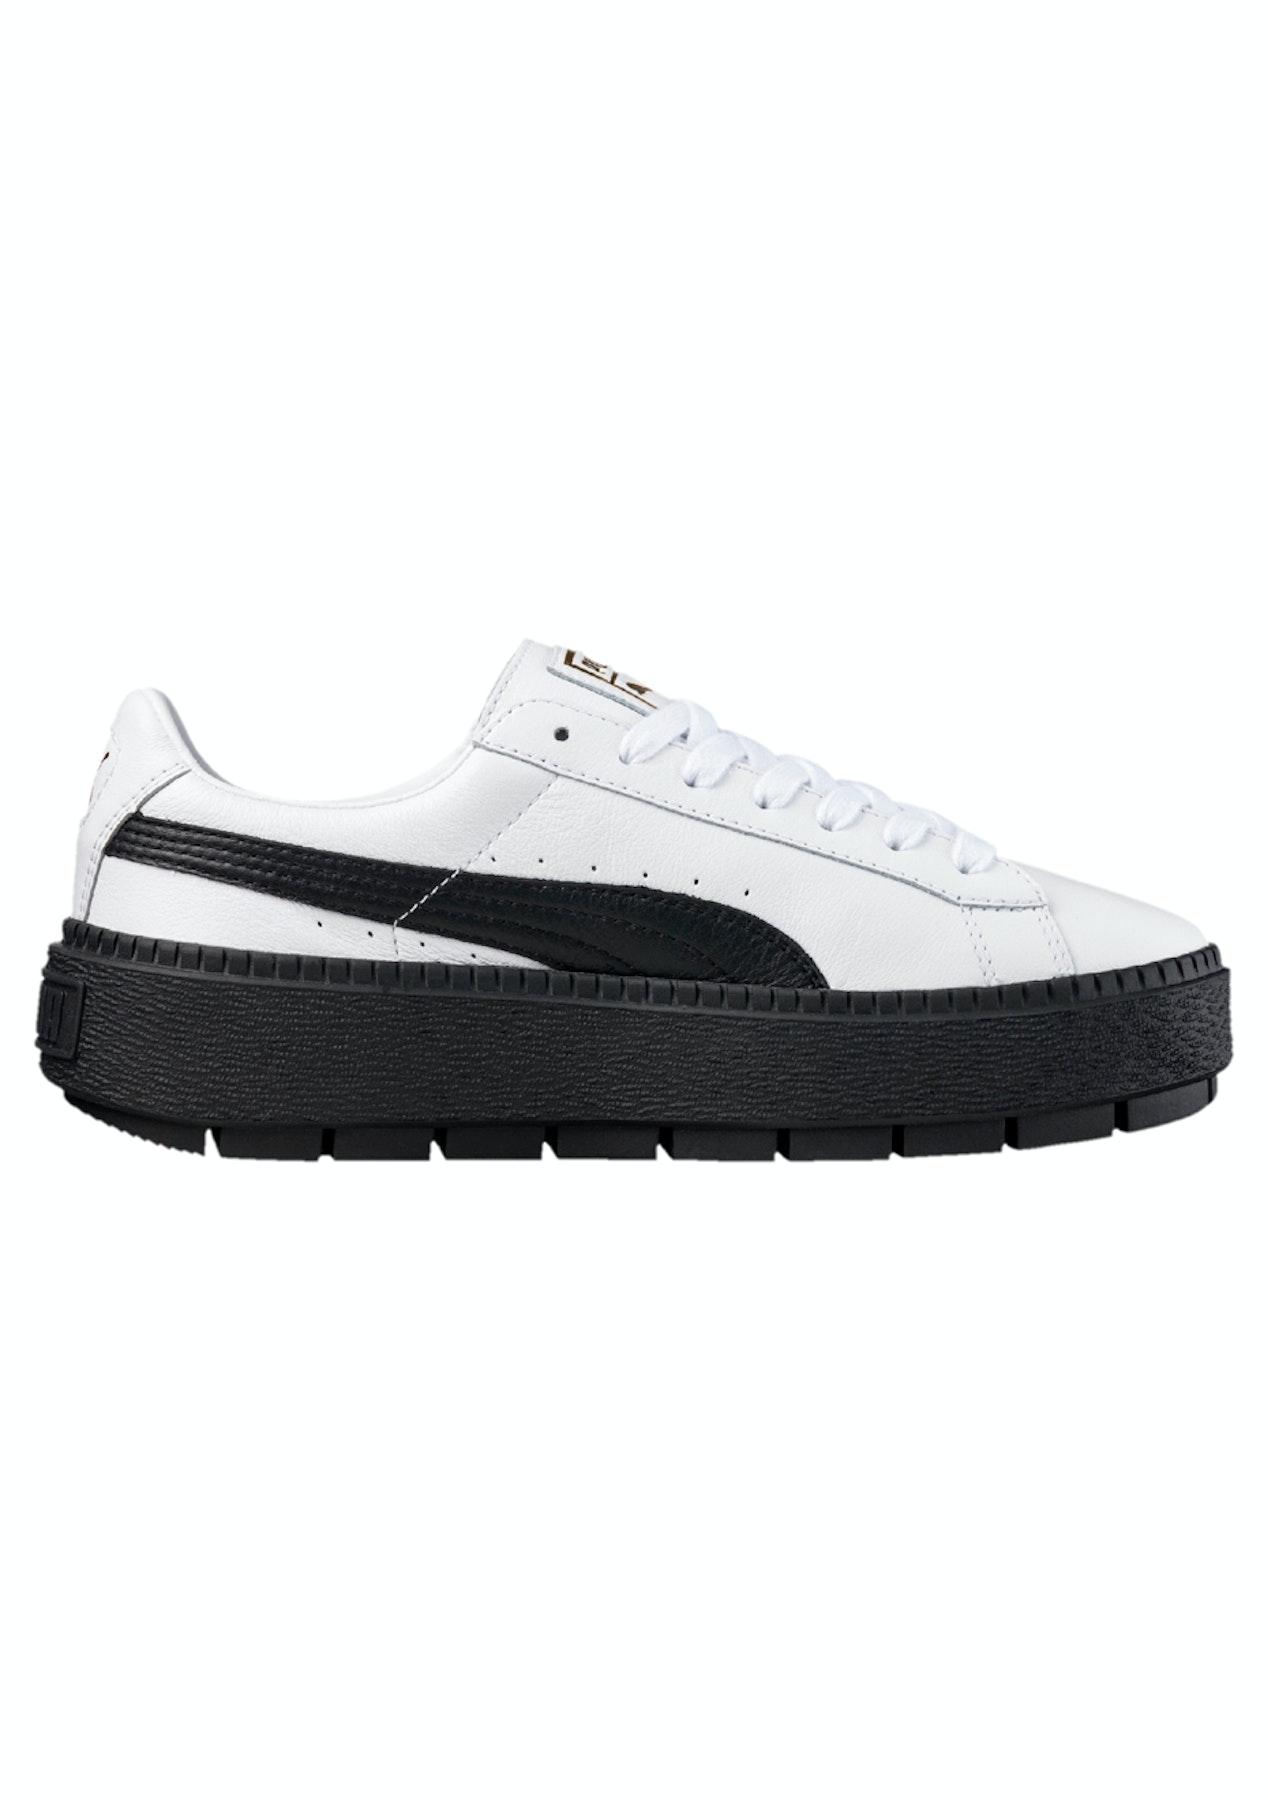 1866ecb4ba0 Puma Womens - Basket Platform Trace - White - Black - Street Shoes + Slides  - Onceit